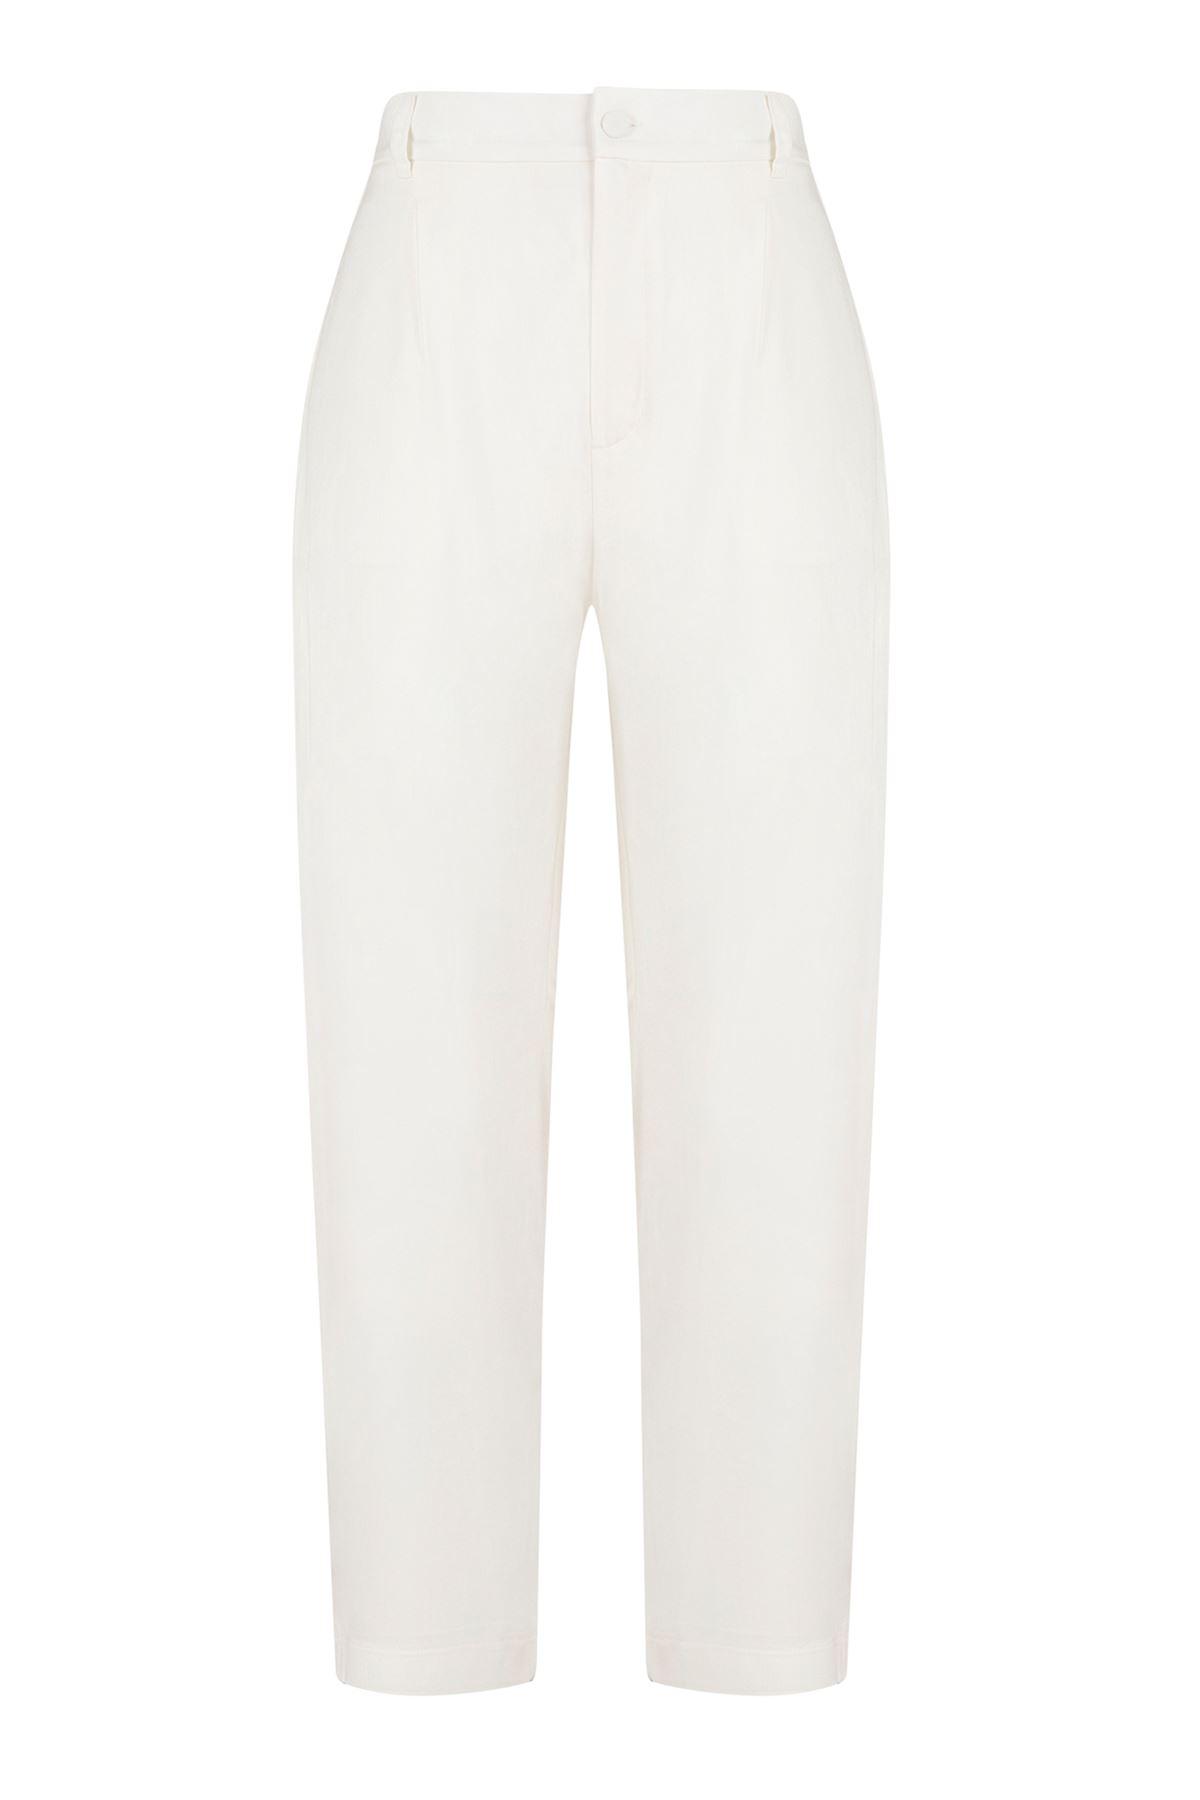 Beyaz Cigaretti Pantolon (Arka Bel Lastikli)